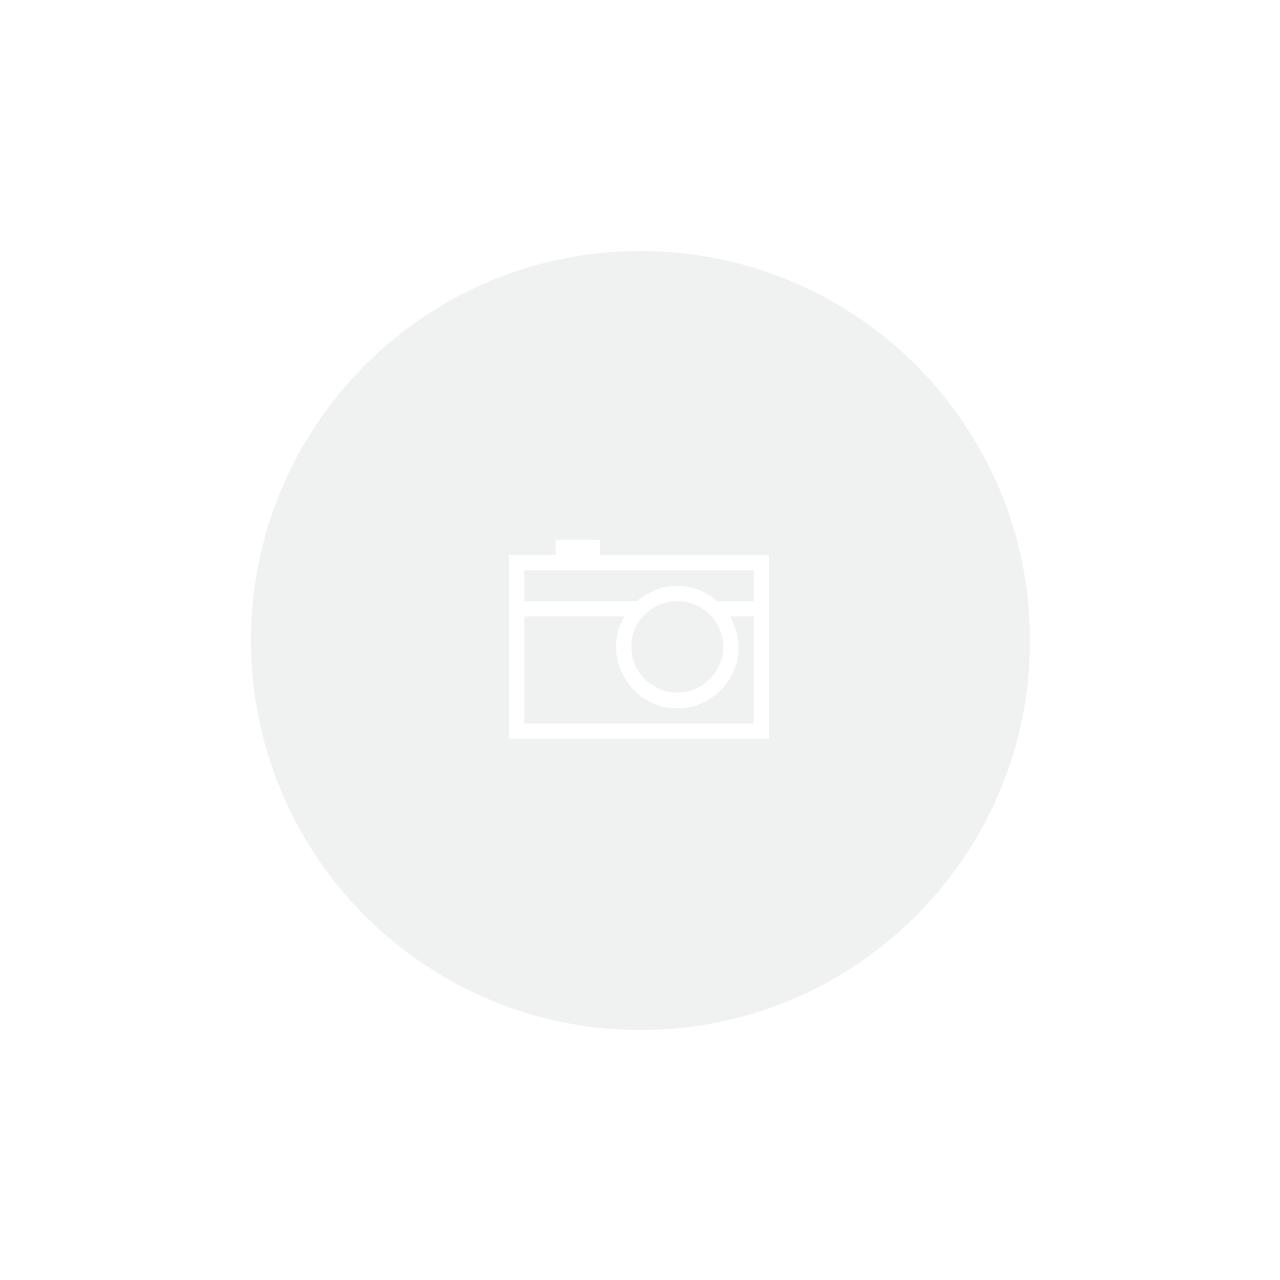 PASTA ANTI-DESLIZANTE ALGOO CARBON GRIP P/ MONT. (100G)